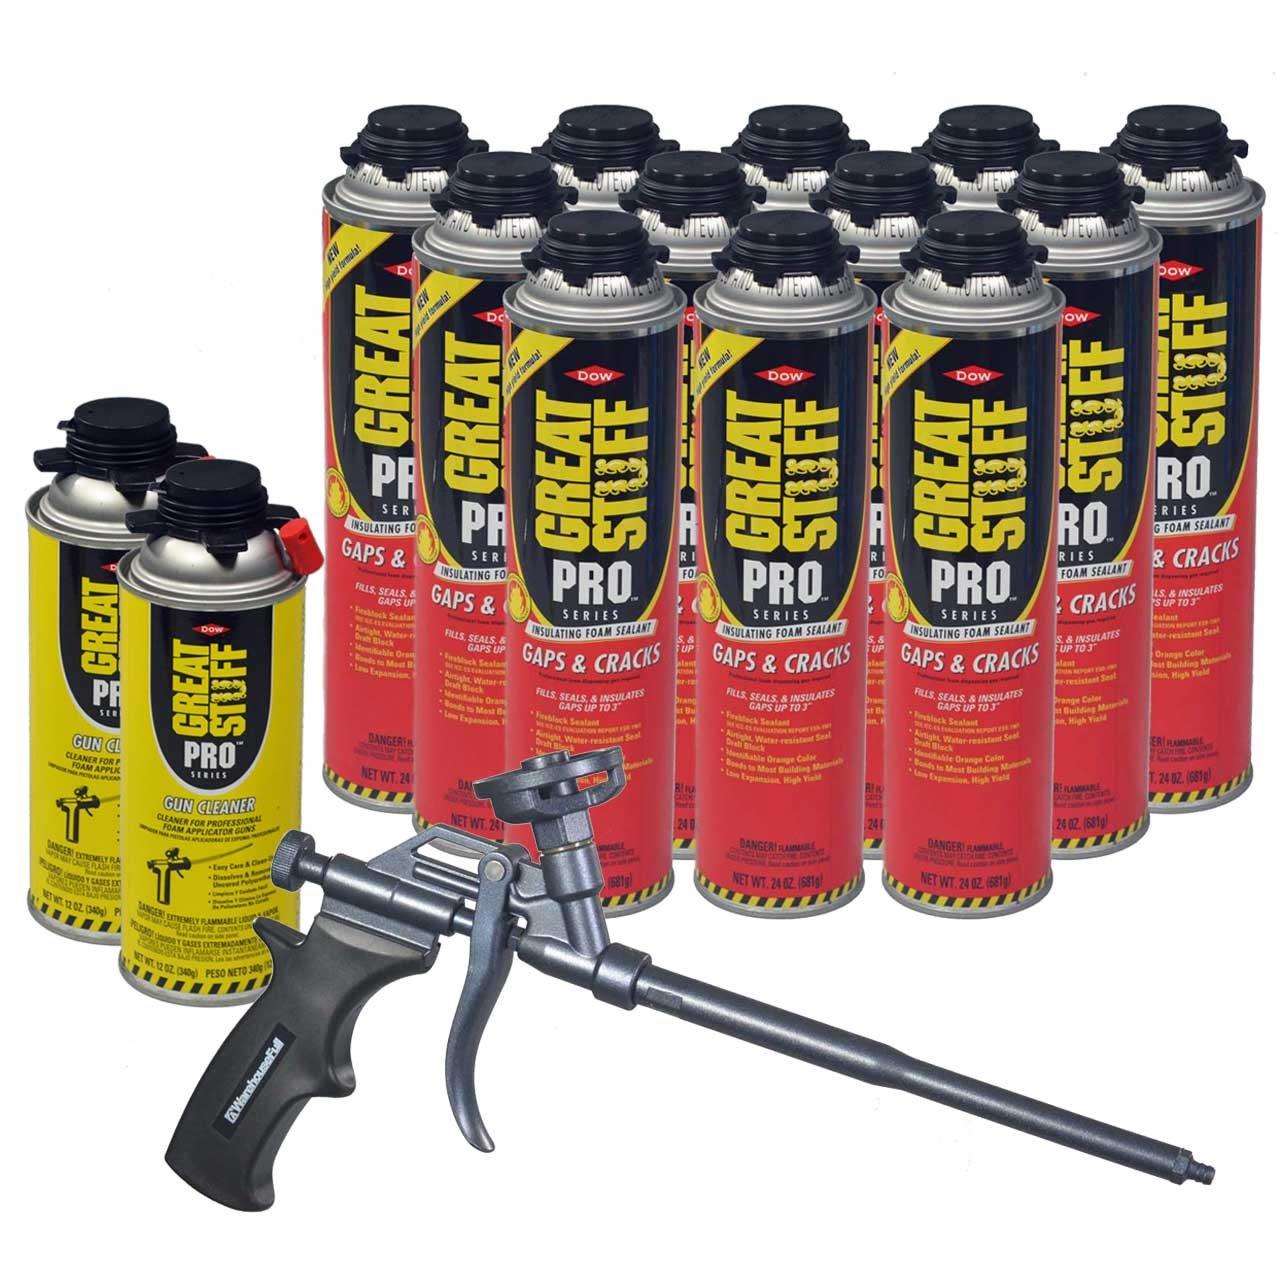 Dow Great Stuff Pro Gaps and Cracks 24 oz Foam (12) + AWF Teflon Pro Foam Gun (1) + Dow Great Stuff Pro foam Gun Cleaner (2)